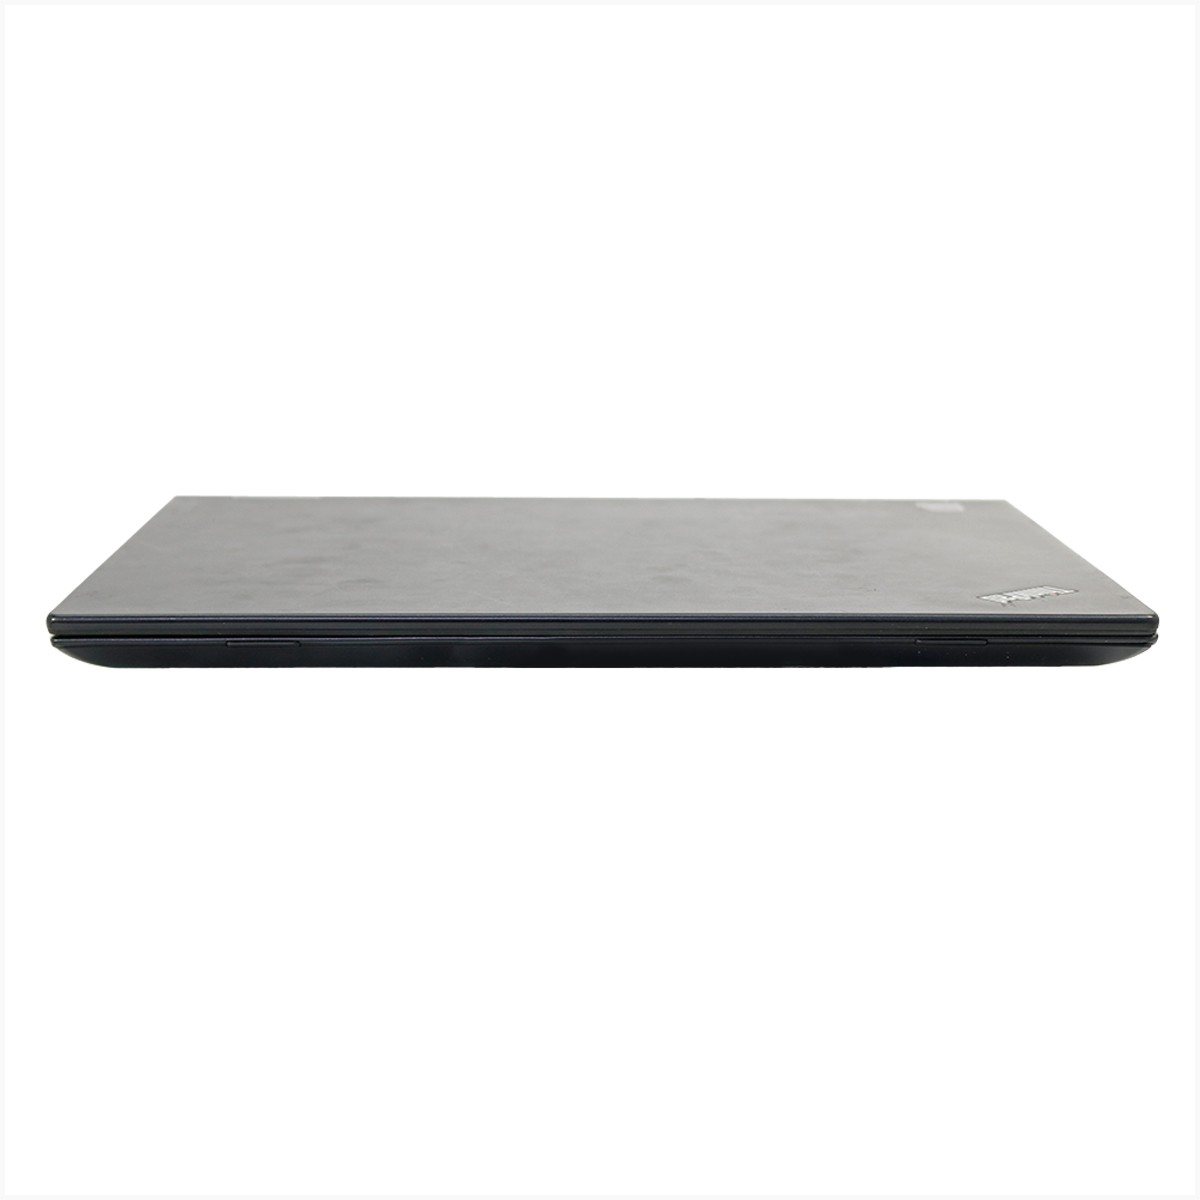 Notebook Lenovo Yoga 260 Touch i5 4gb 240gb Ssd M.2 - Usado